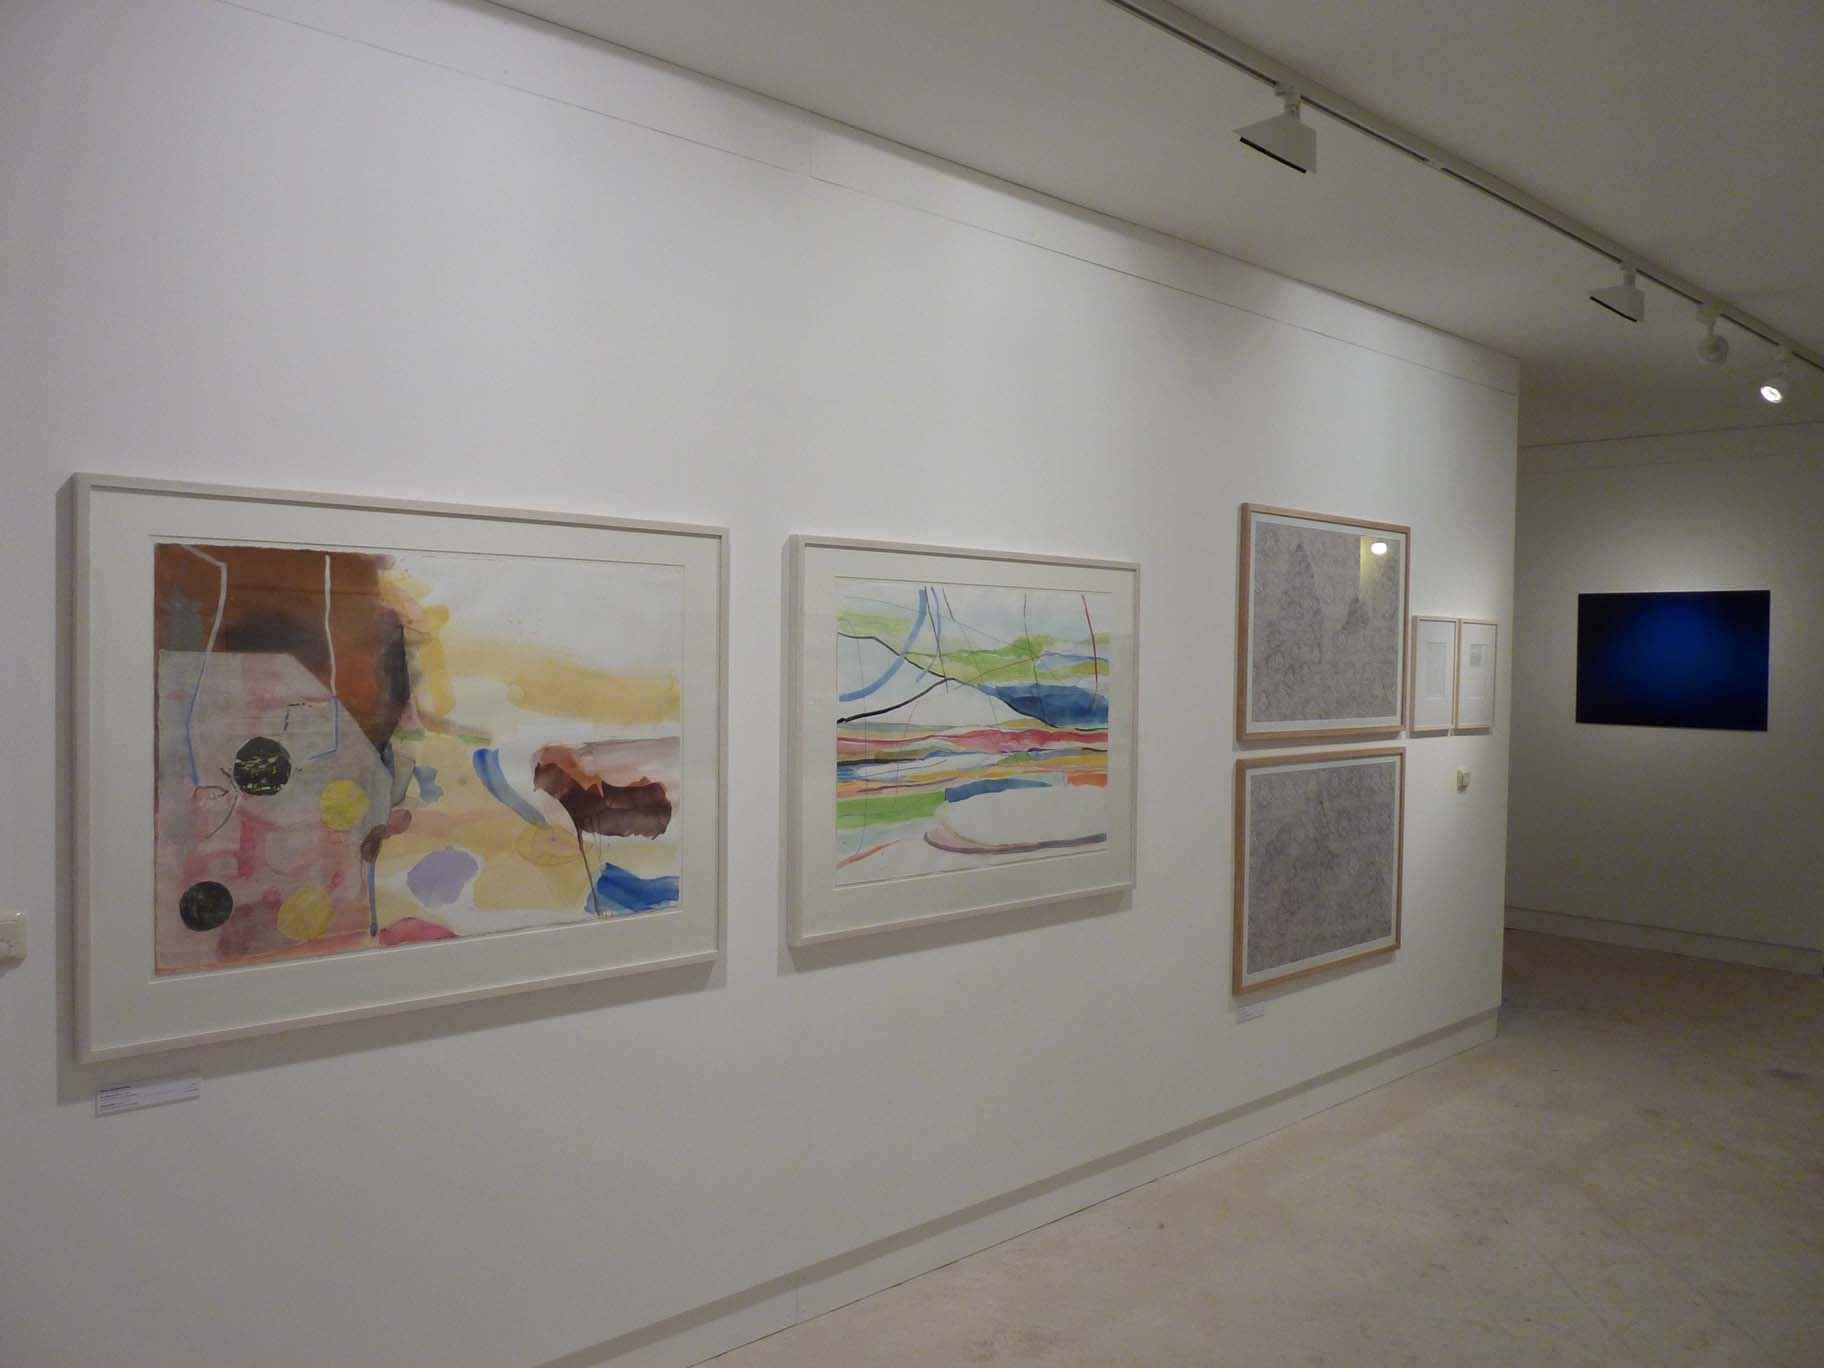 09-12-18 Ausstellung 4